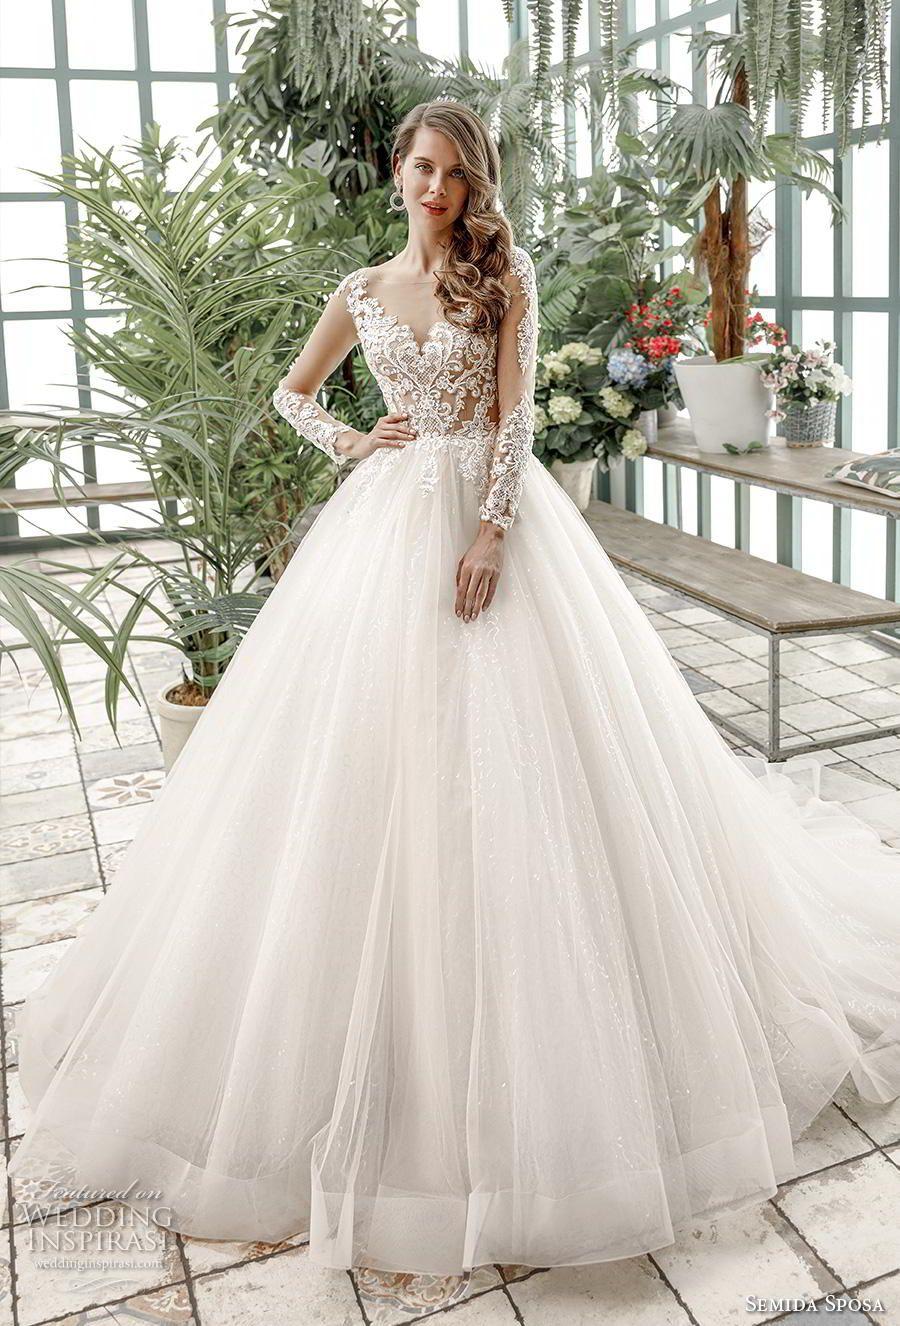 Semida Sposa 2020 Wedding Dresses Amazon Bridal Collection Wedding Inspirasi Wedding Dresses Amazon Wedding Dresses Wedding Dress Accessories